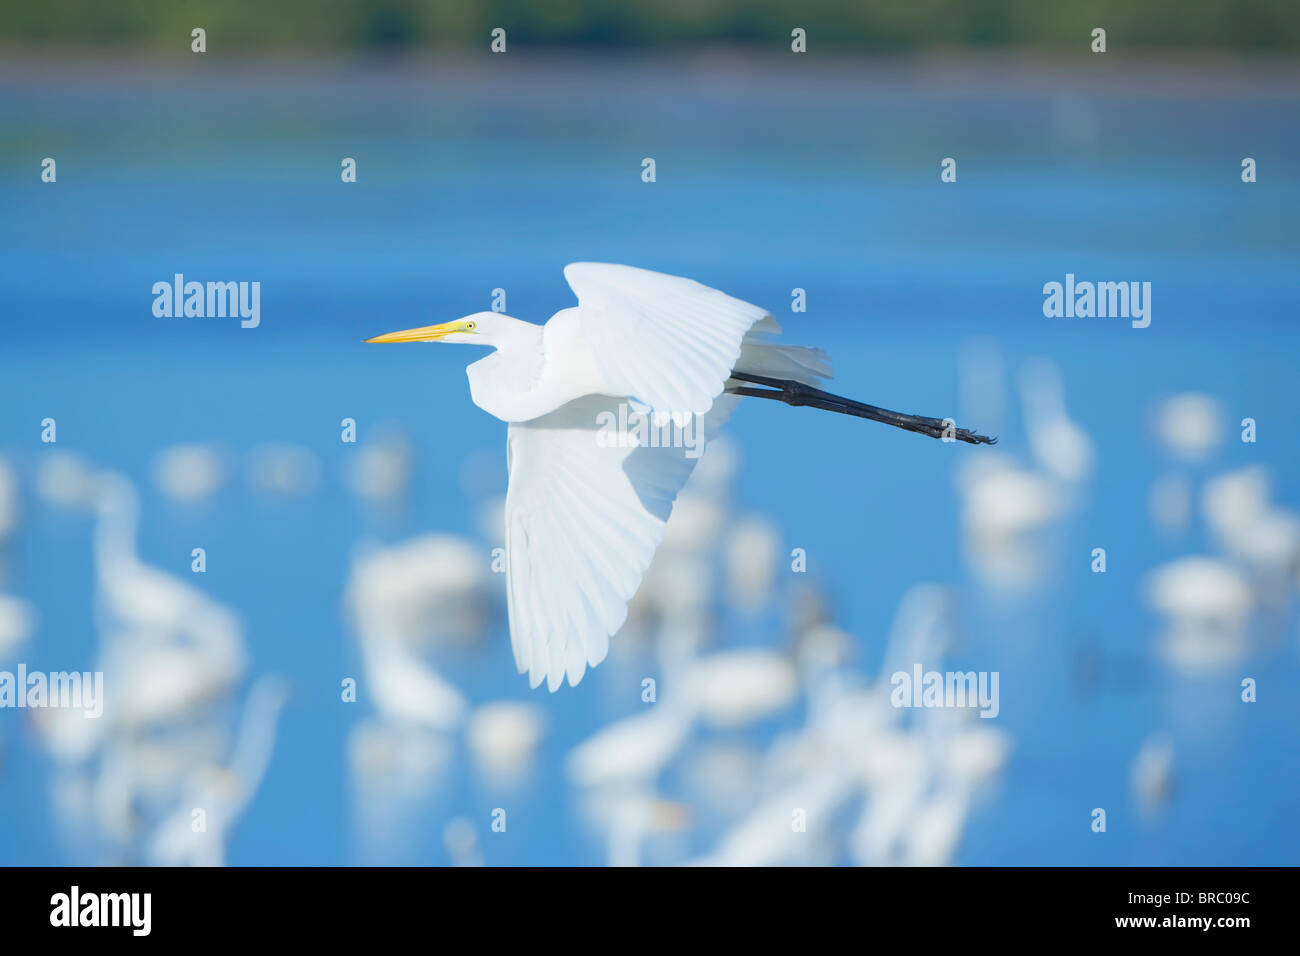 Great Egret (Casmerodius albus) in flight, Sanibel Island, J. N. Ding Darling National Wildlife Refuge, Florida, - Stock Image